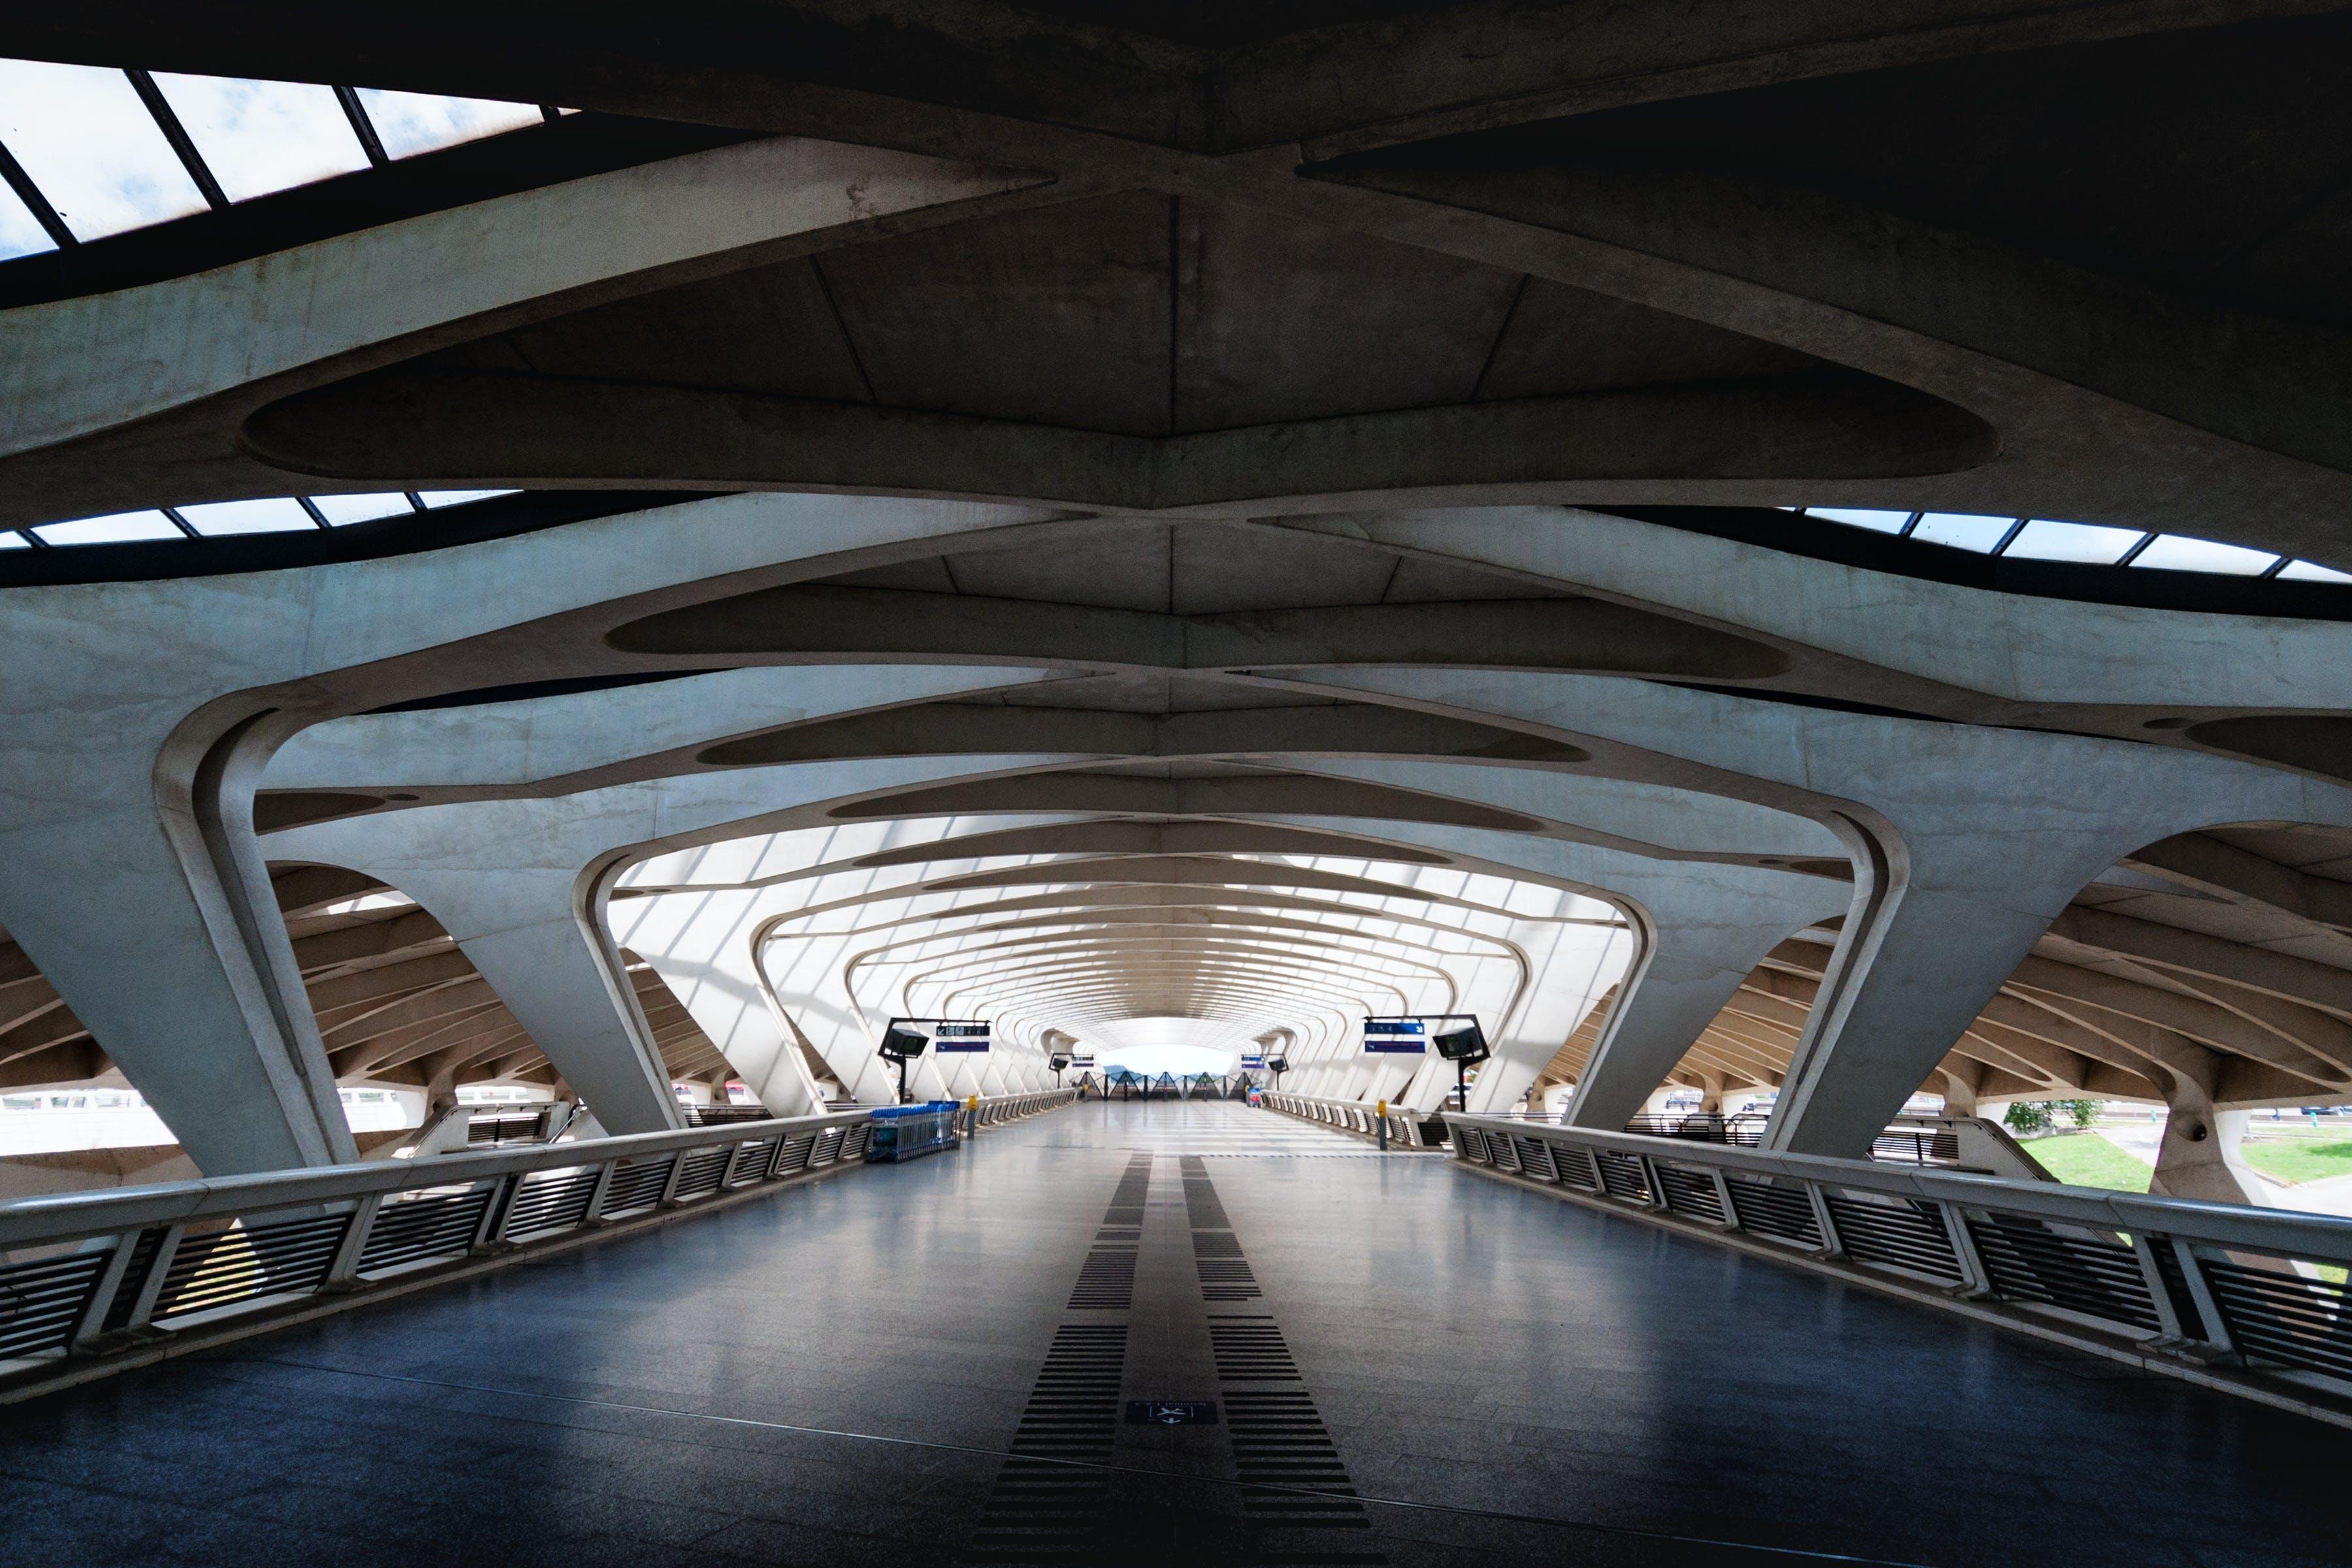 Kostnadsfri bild av arkitektonisk design, bro, ljus, metall